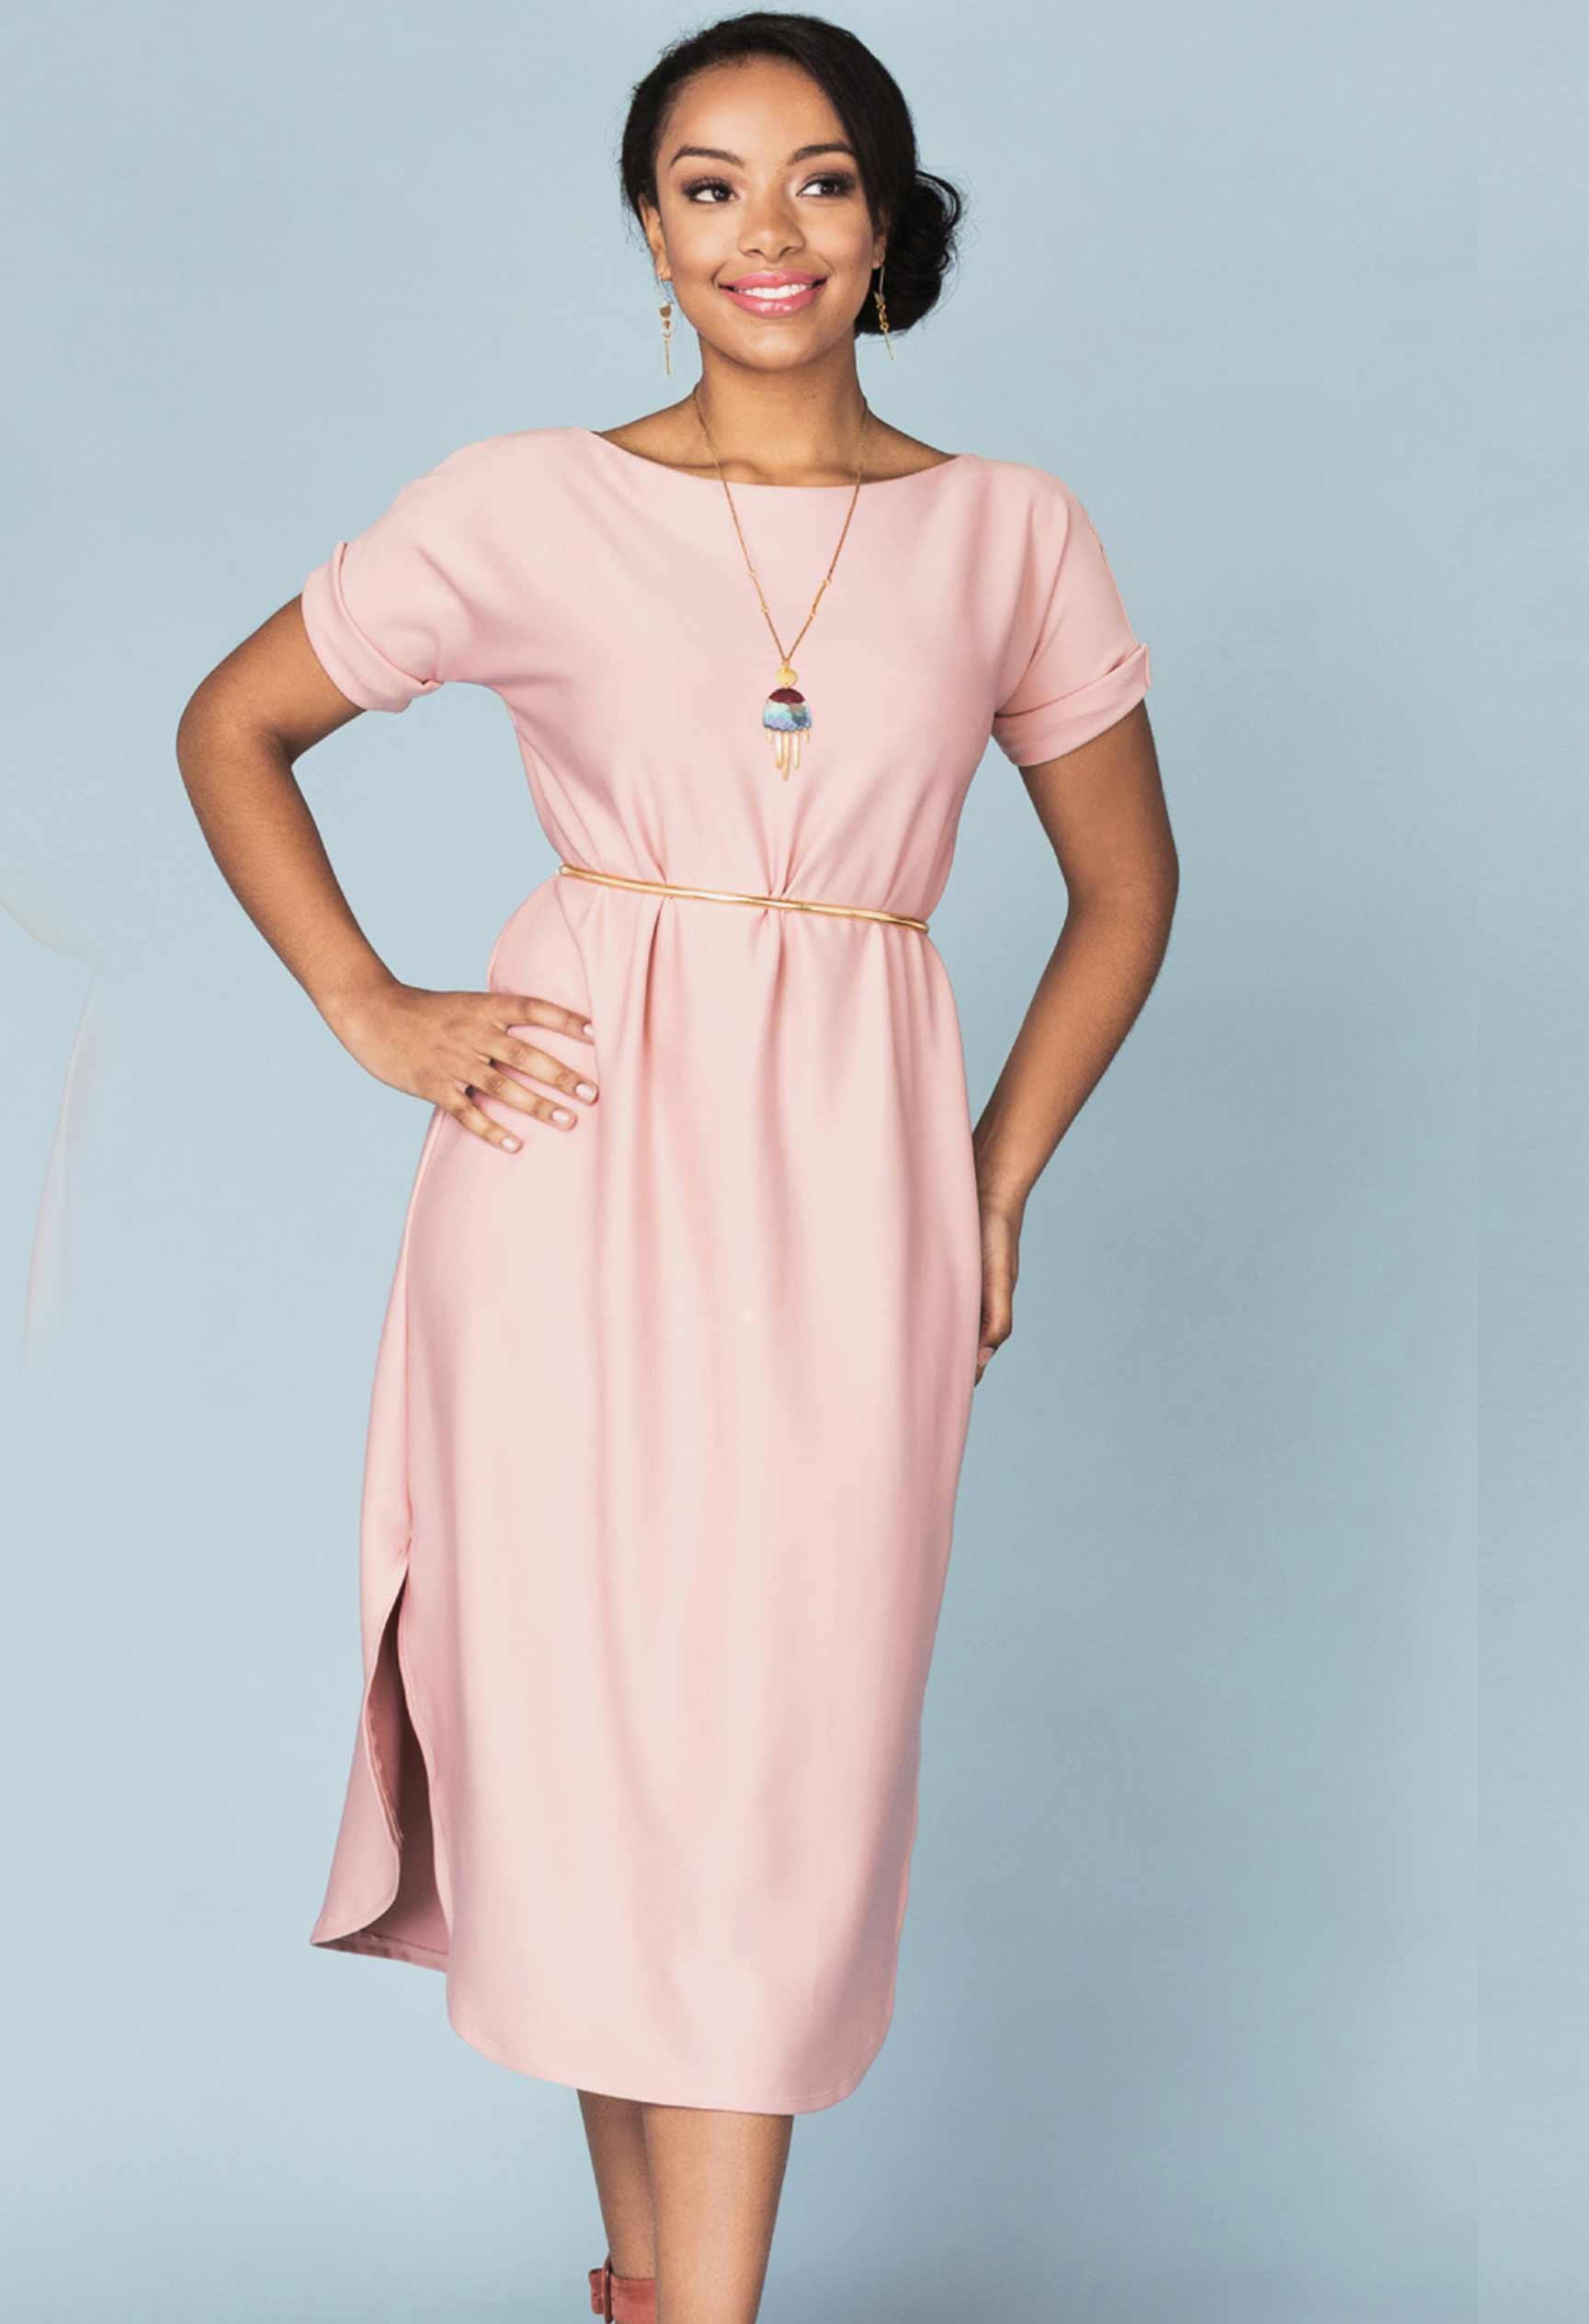 Our-Lady-Of-Leisure-Lemon -Drop-Dress-Top-Lockdown-Sewing